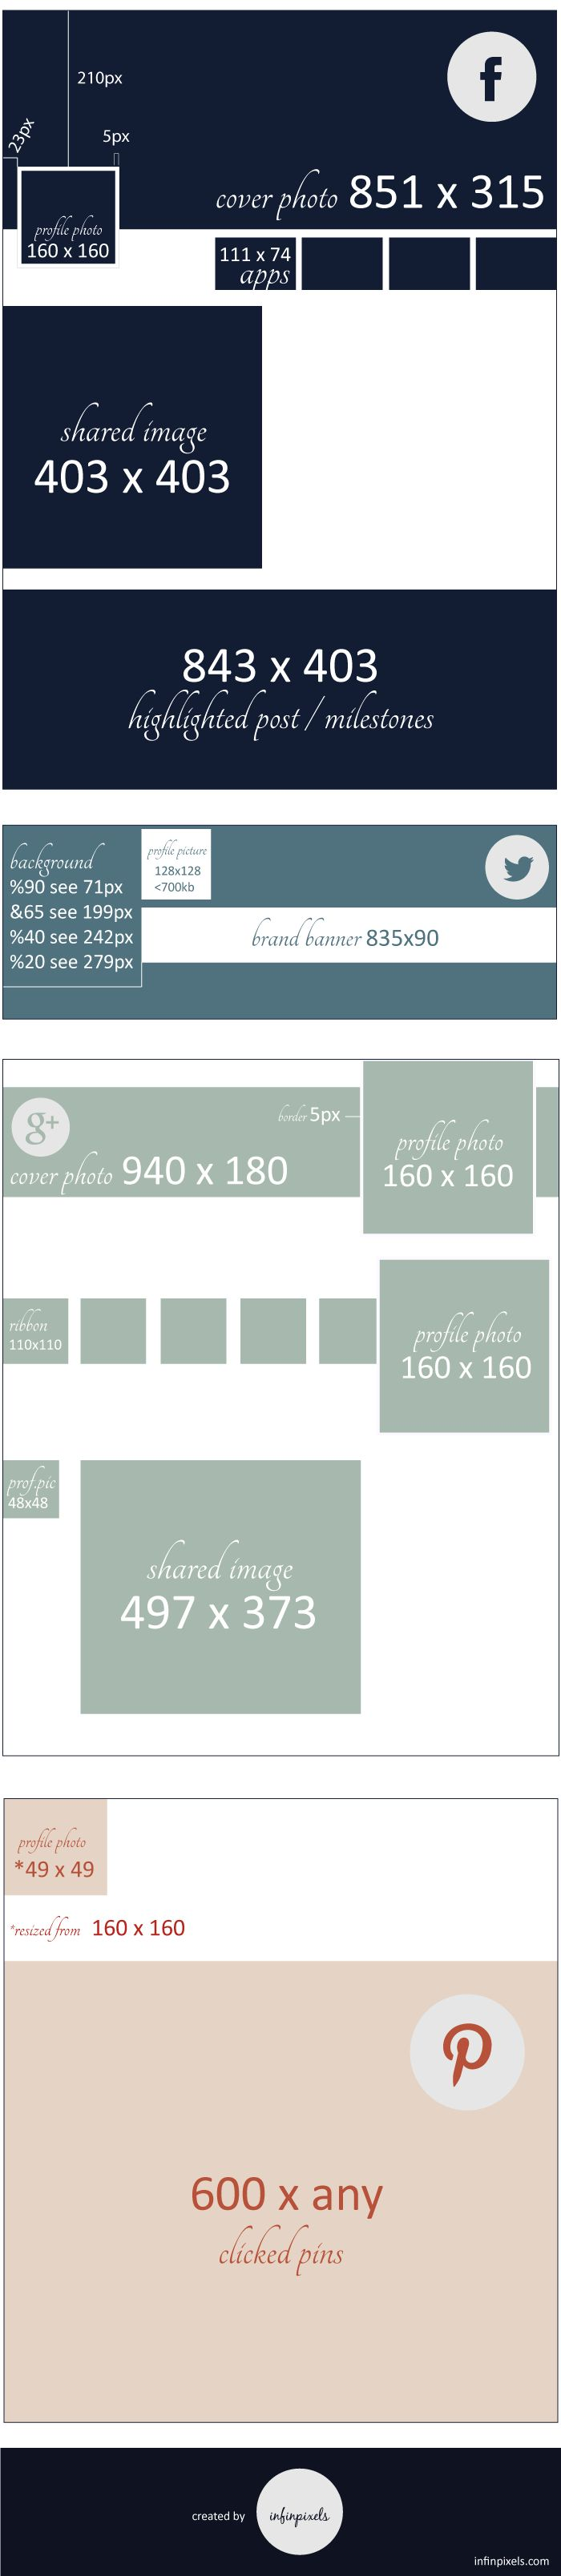 #Social #Media #Sizing #infographic via InfinPixels